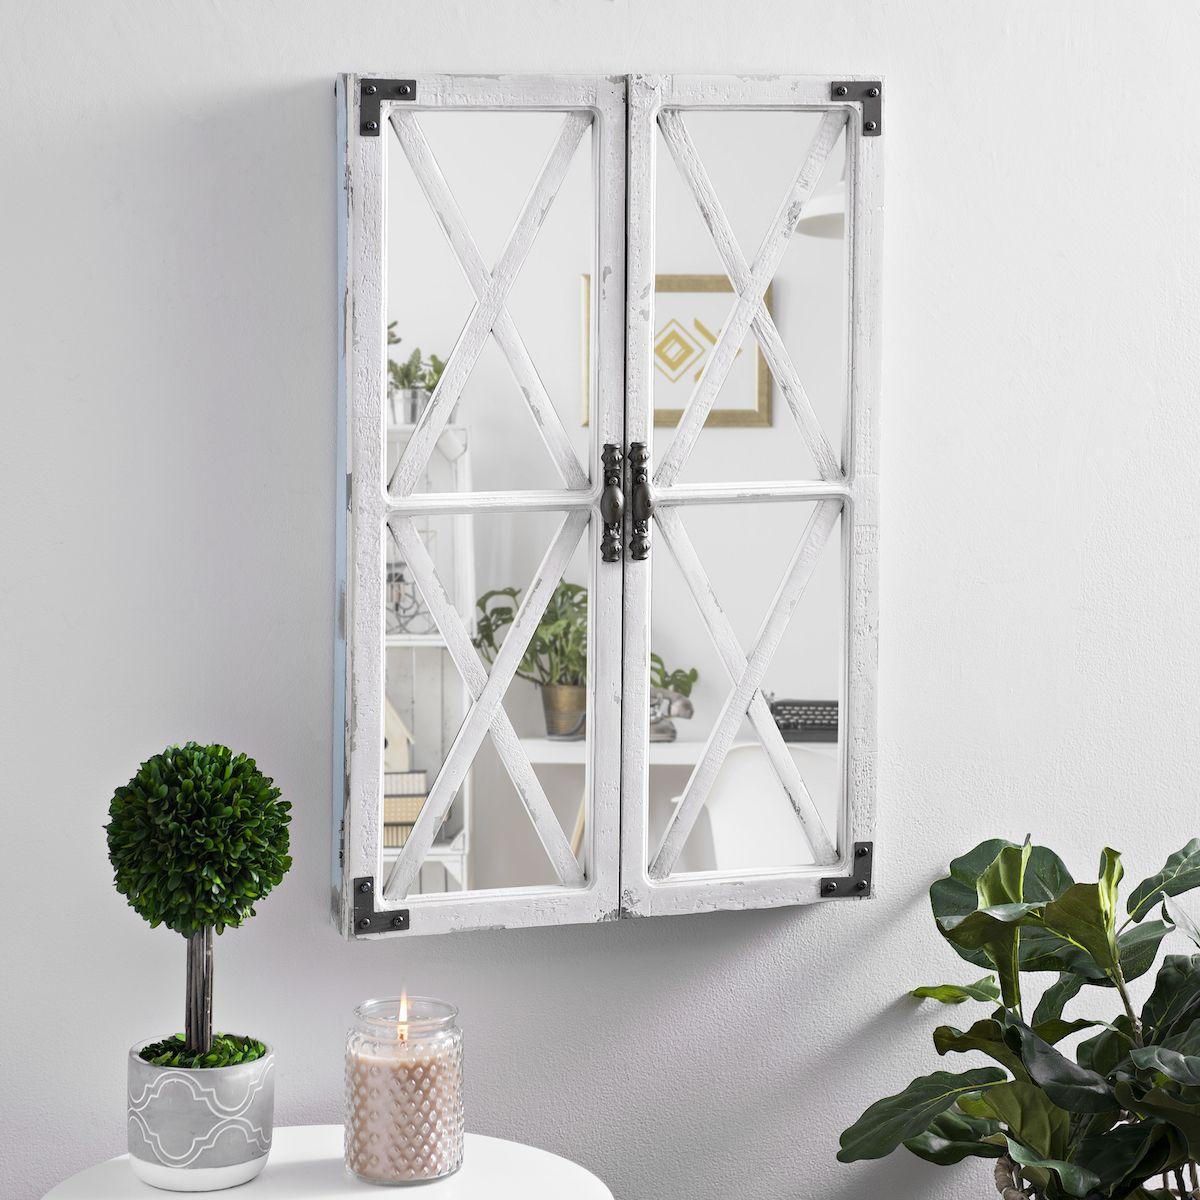 White Shutter Barn Door Decorative Mirror White shutters